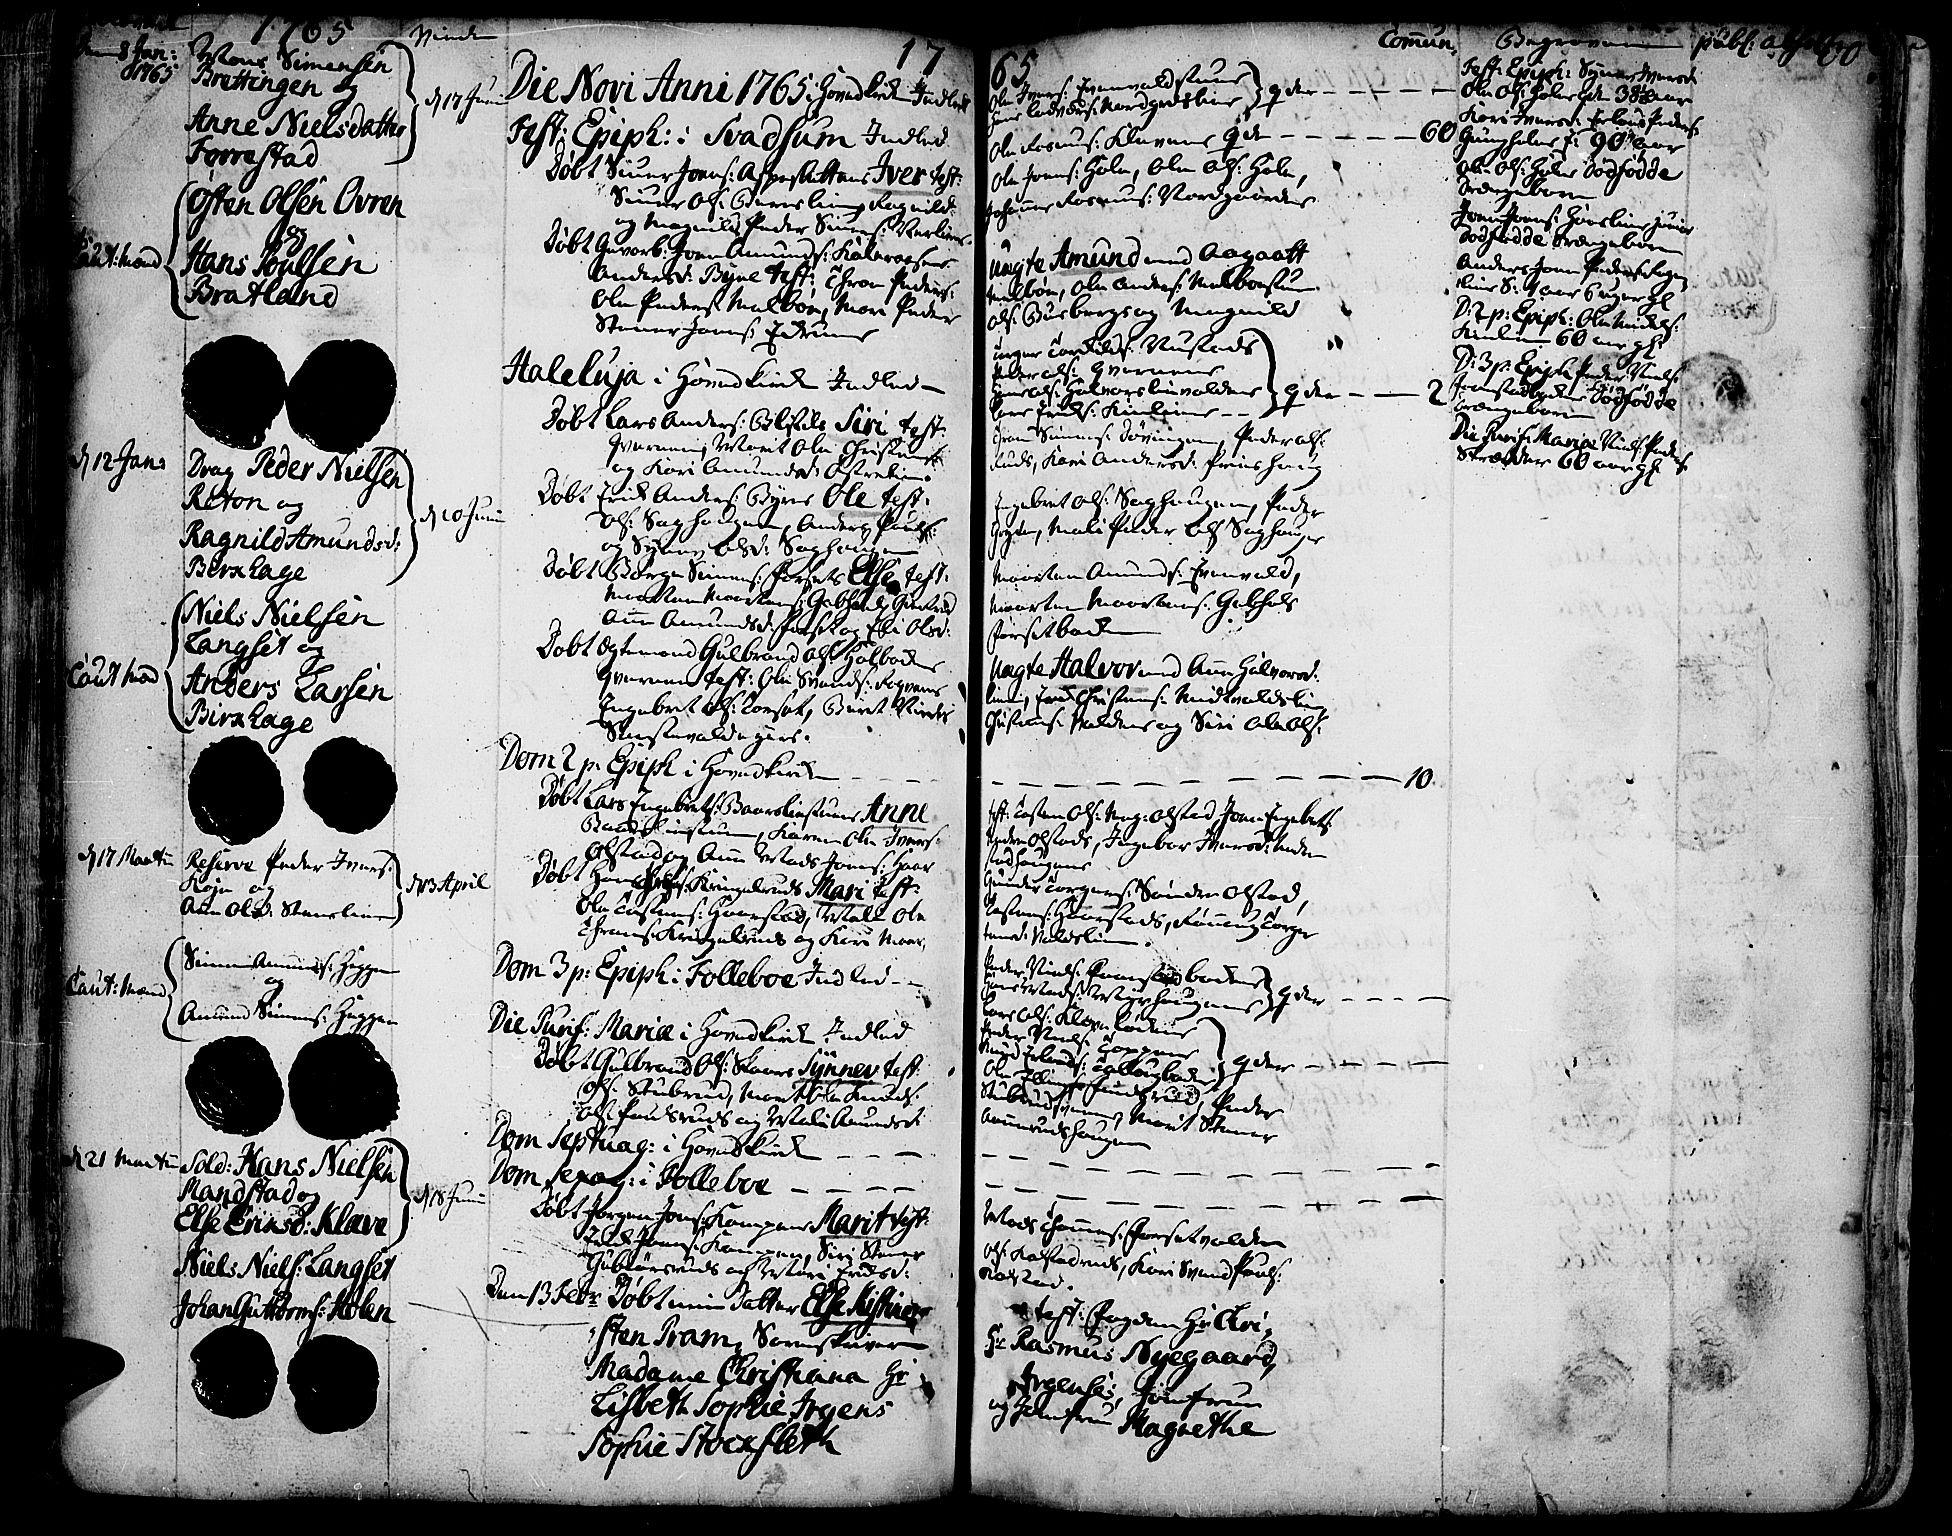 SAH, Gausdal prestekontor, Ministerialbok nr. 3, 1758-1809, s. 60